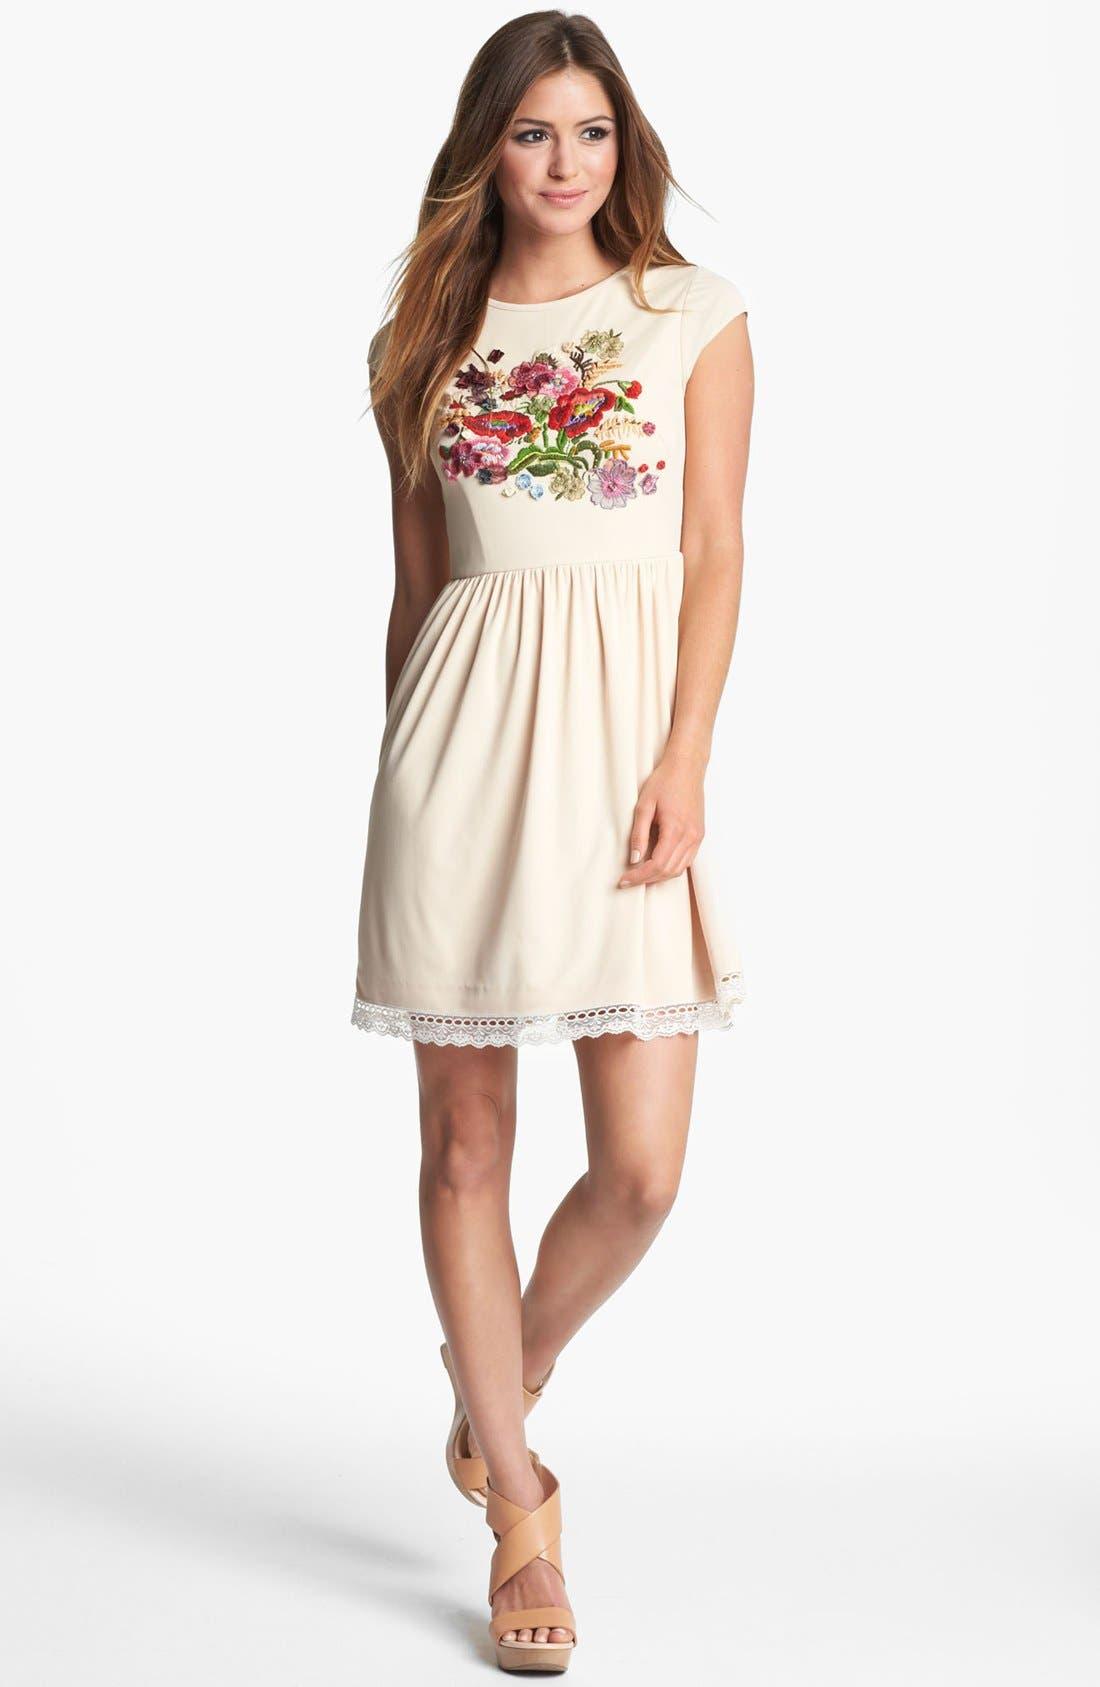 Alternate Image 1 Selected - LABEL by five twelve Floral Appliqué Fit & Flare Dress